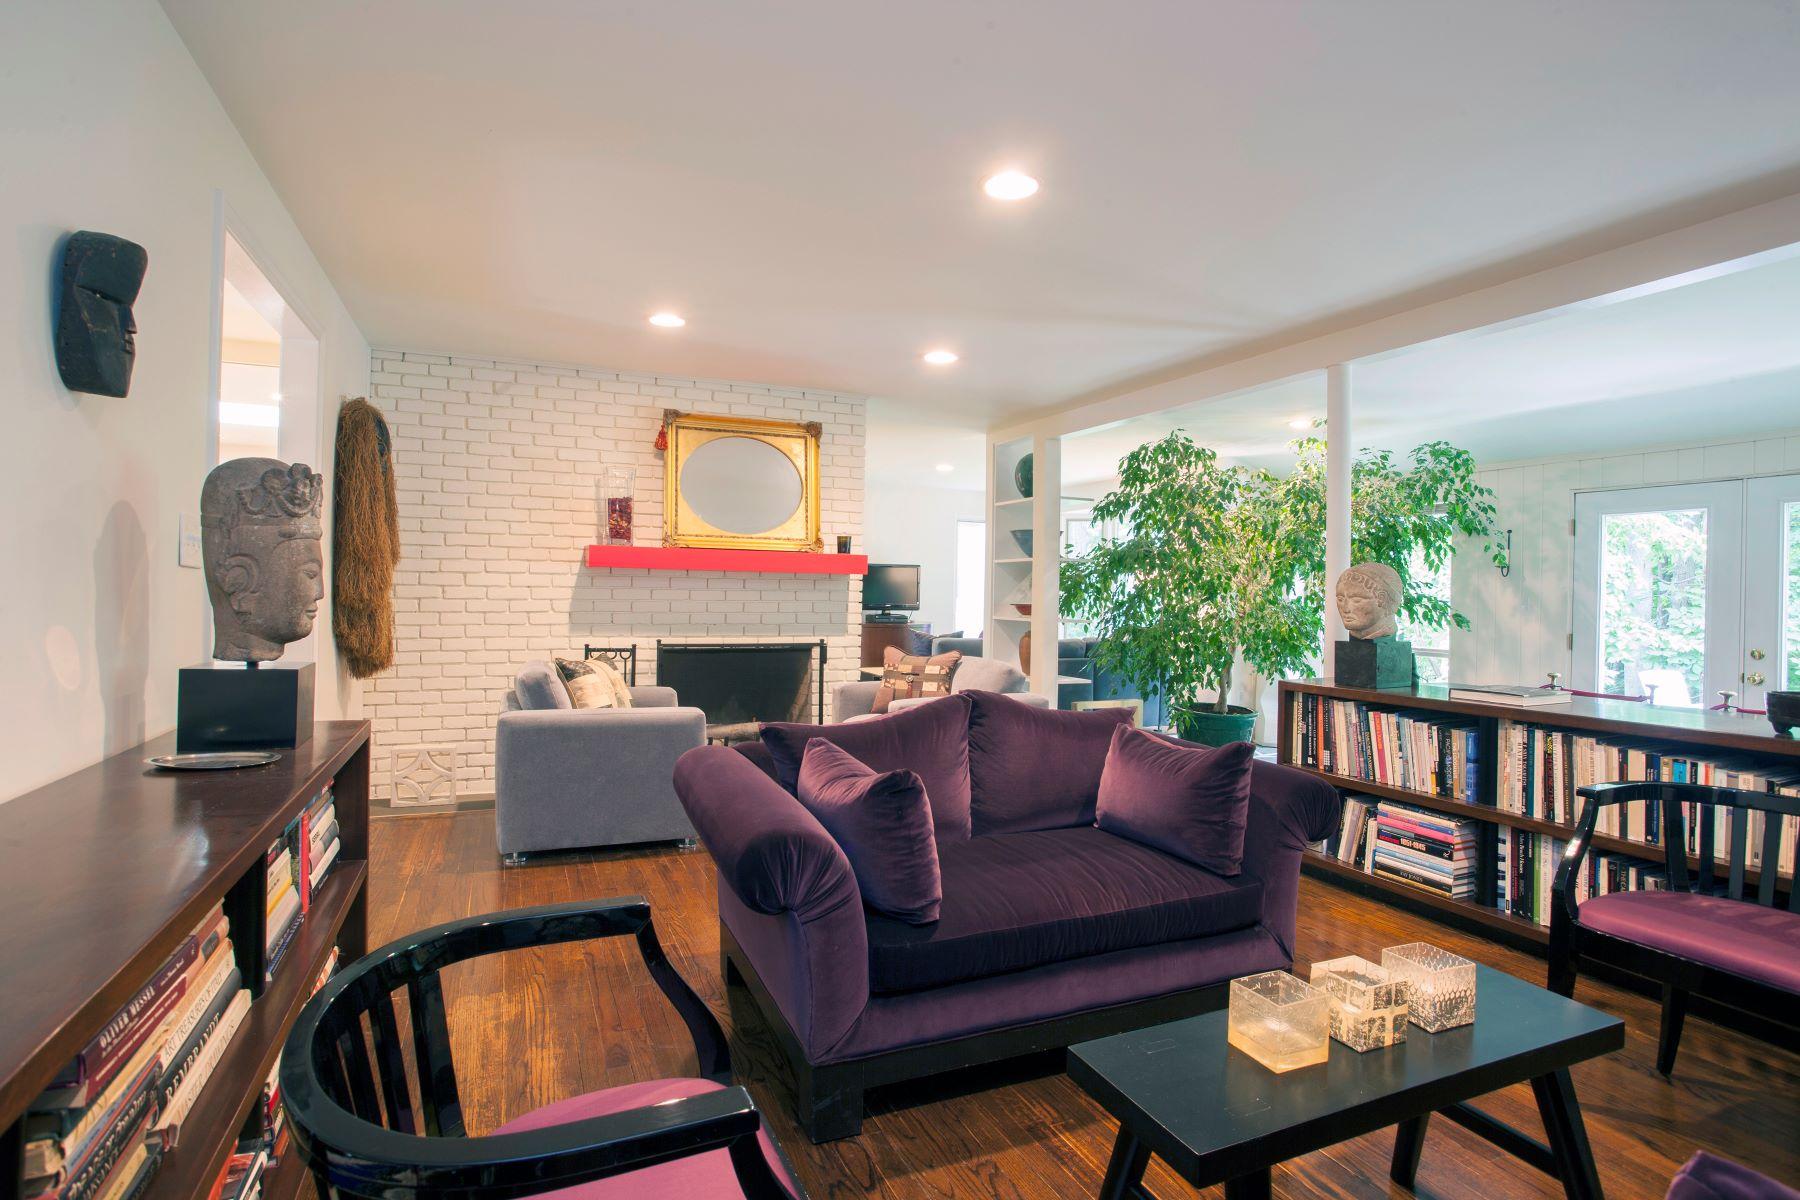 واحد منزل الأسرة للـ Sale في Chic and Modern One Level Home 131 North Street, Roxbury, Connecticut, 06783 United States